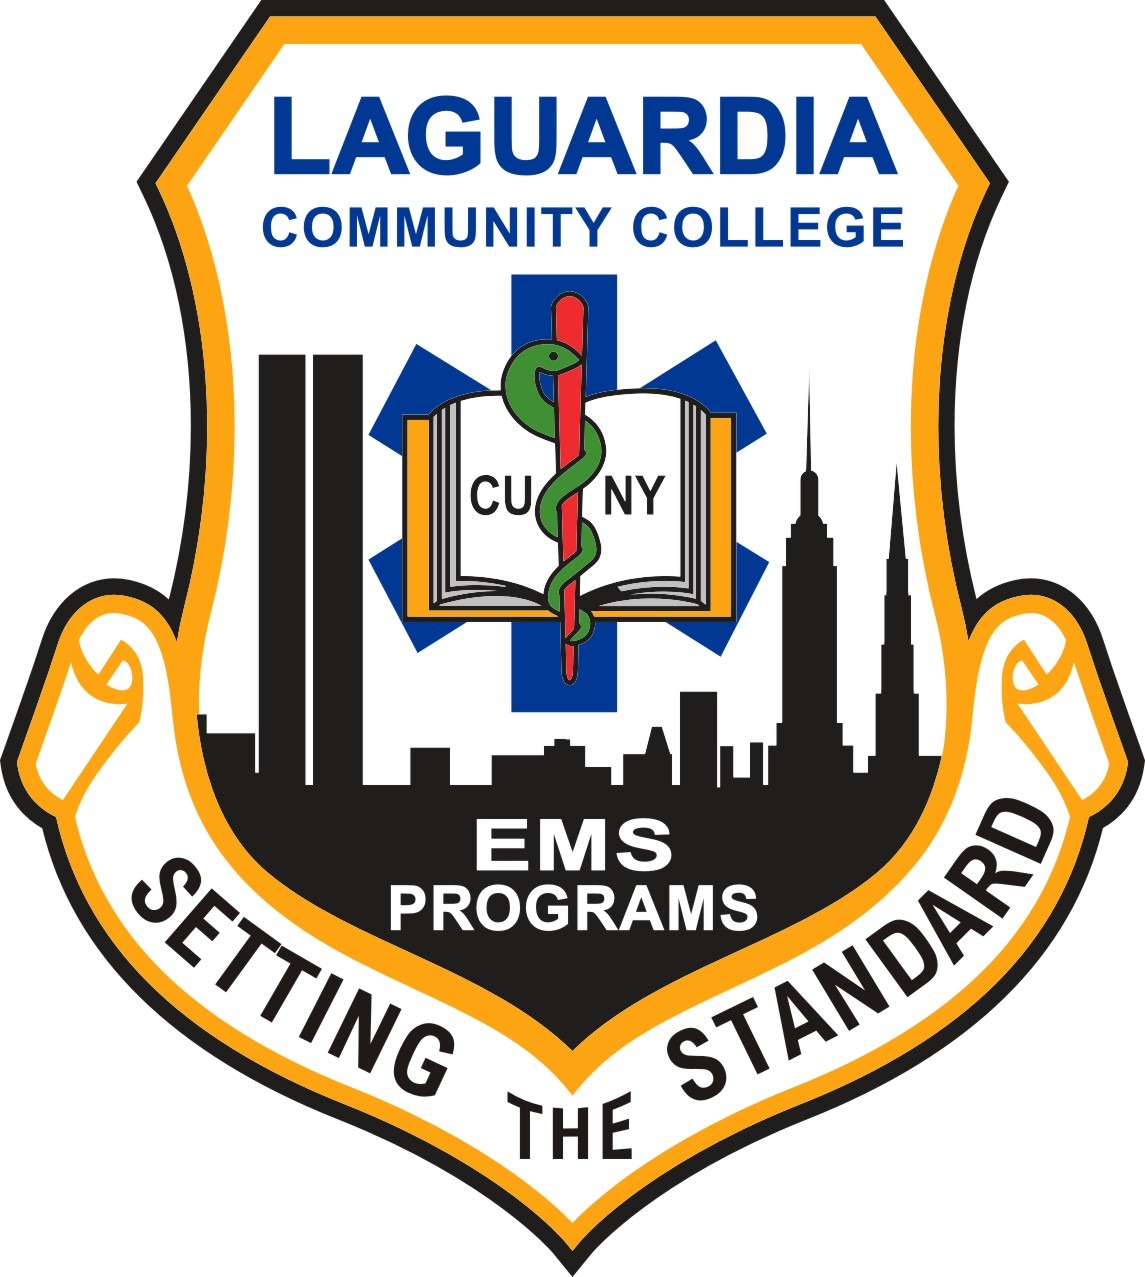 LaGuardia College EMT Evening Course – over 6,000 EMT graduates, become the next!